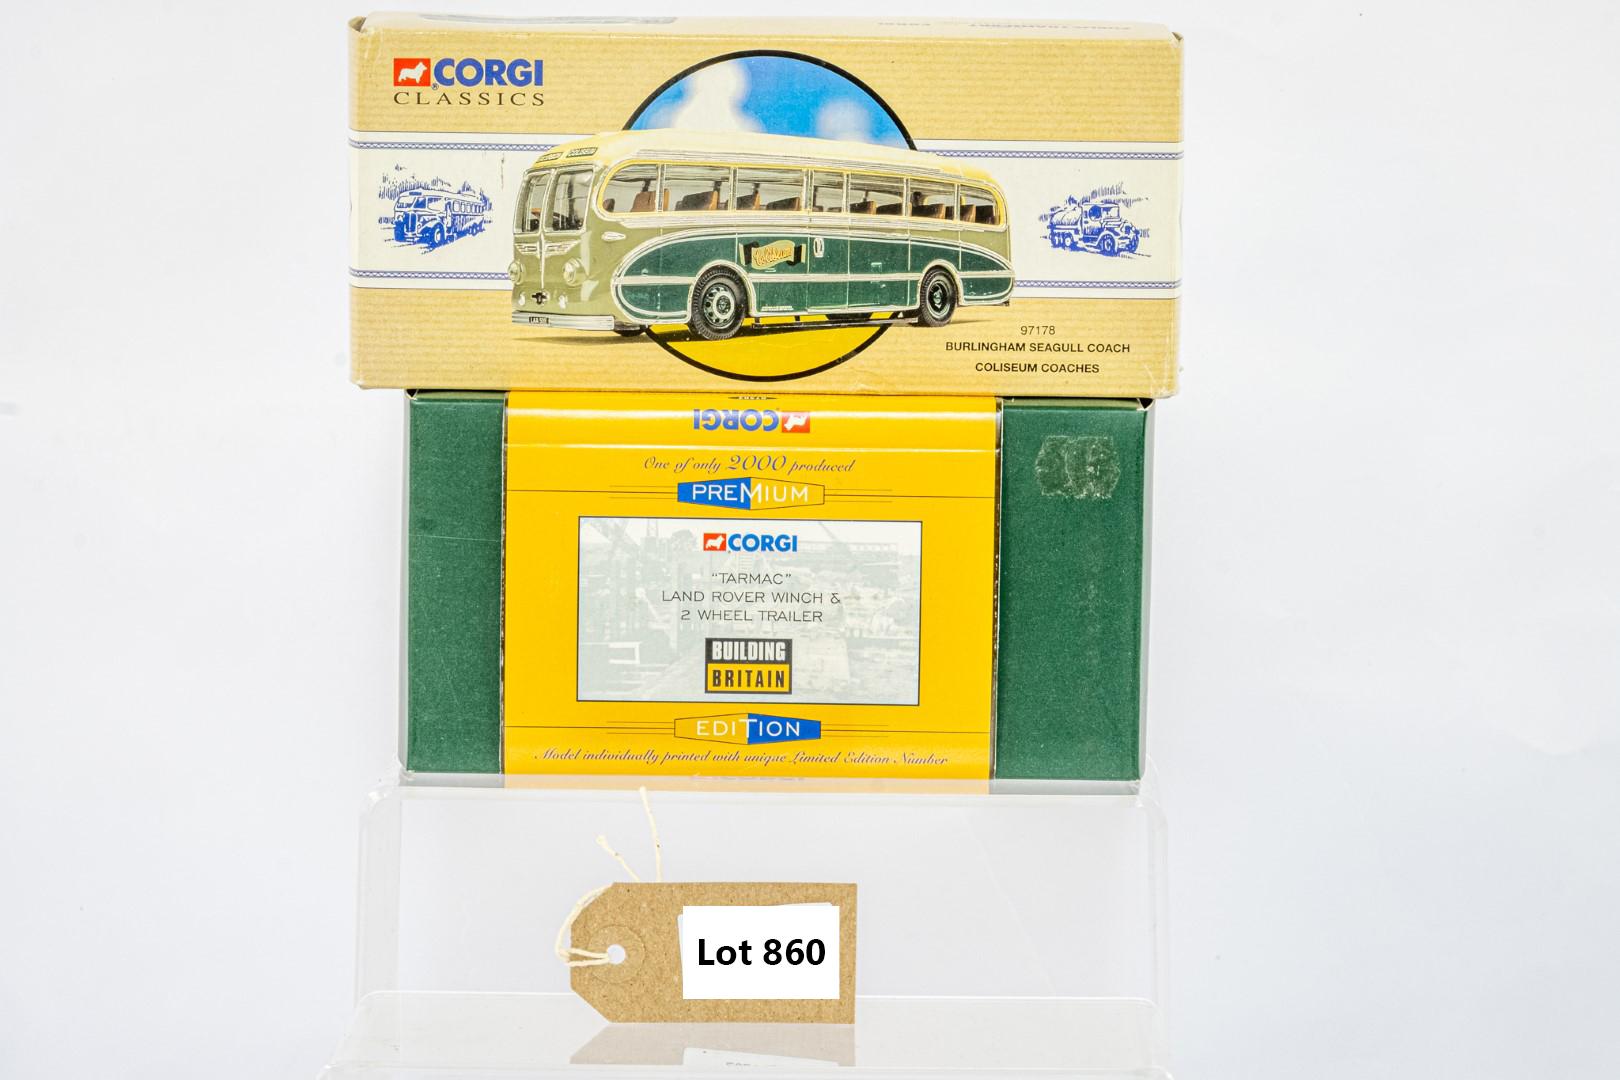 Corgi Burlingham Seagull Coach - Coliseum Coaches / Landrover Winch & 2 Wheel Loader - Tarmac